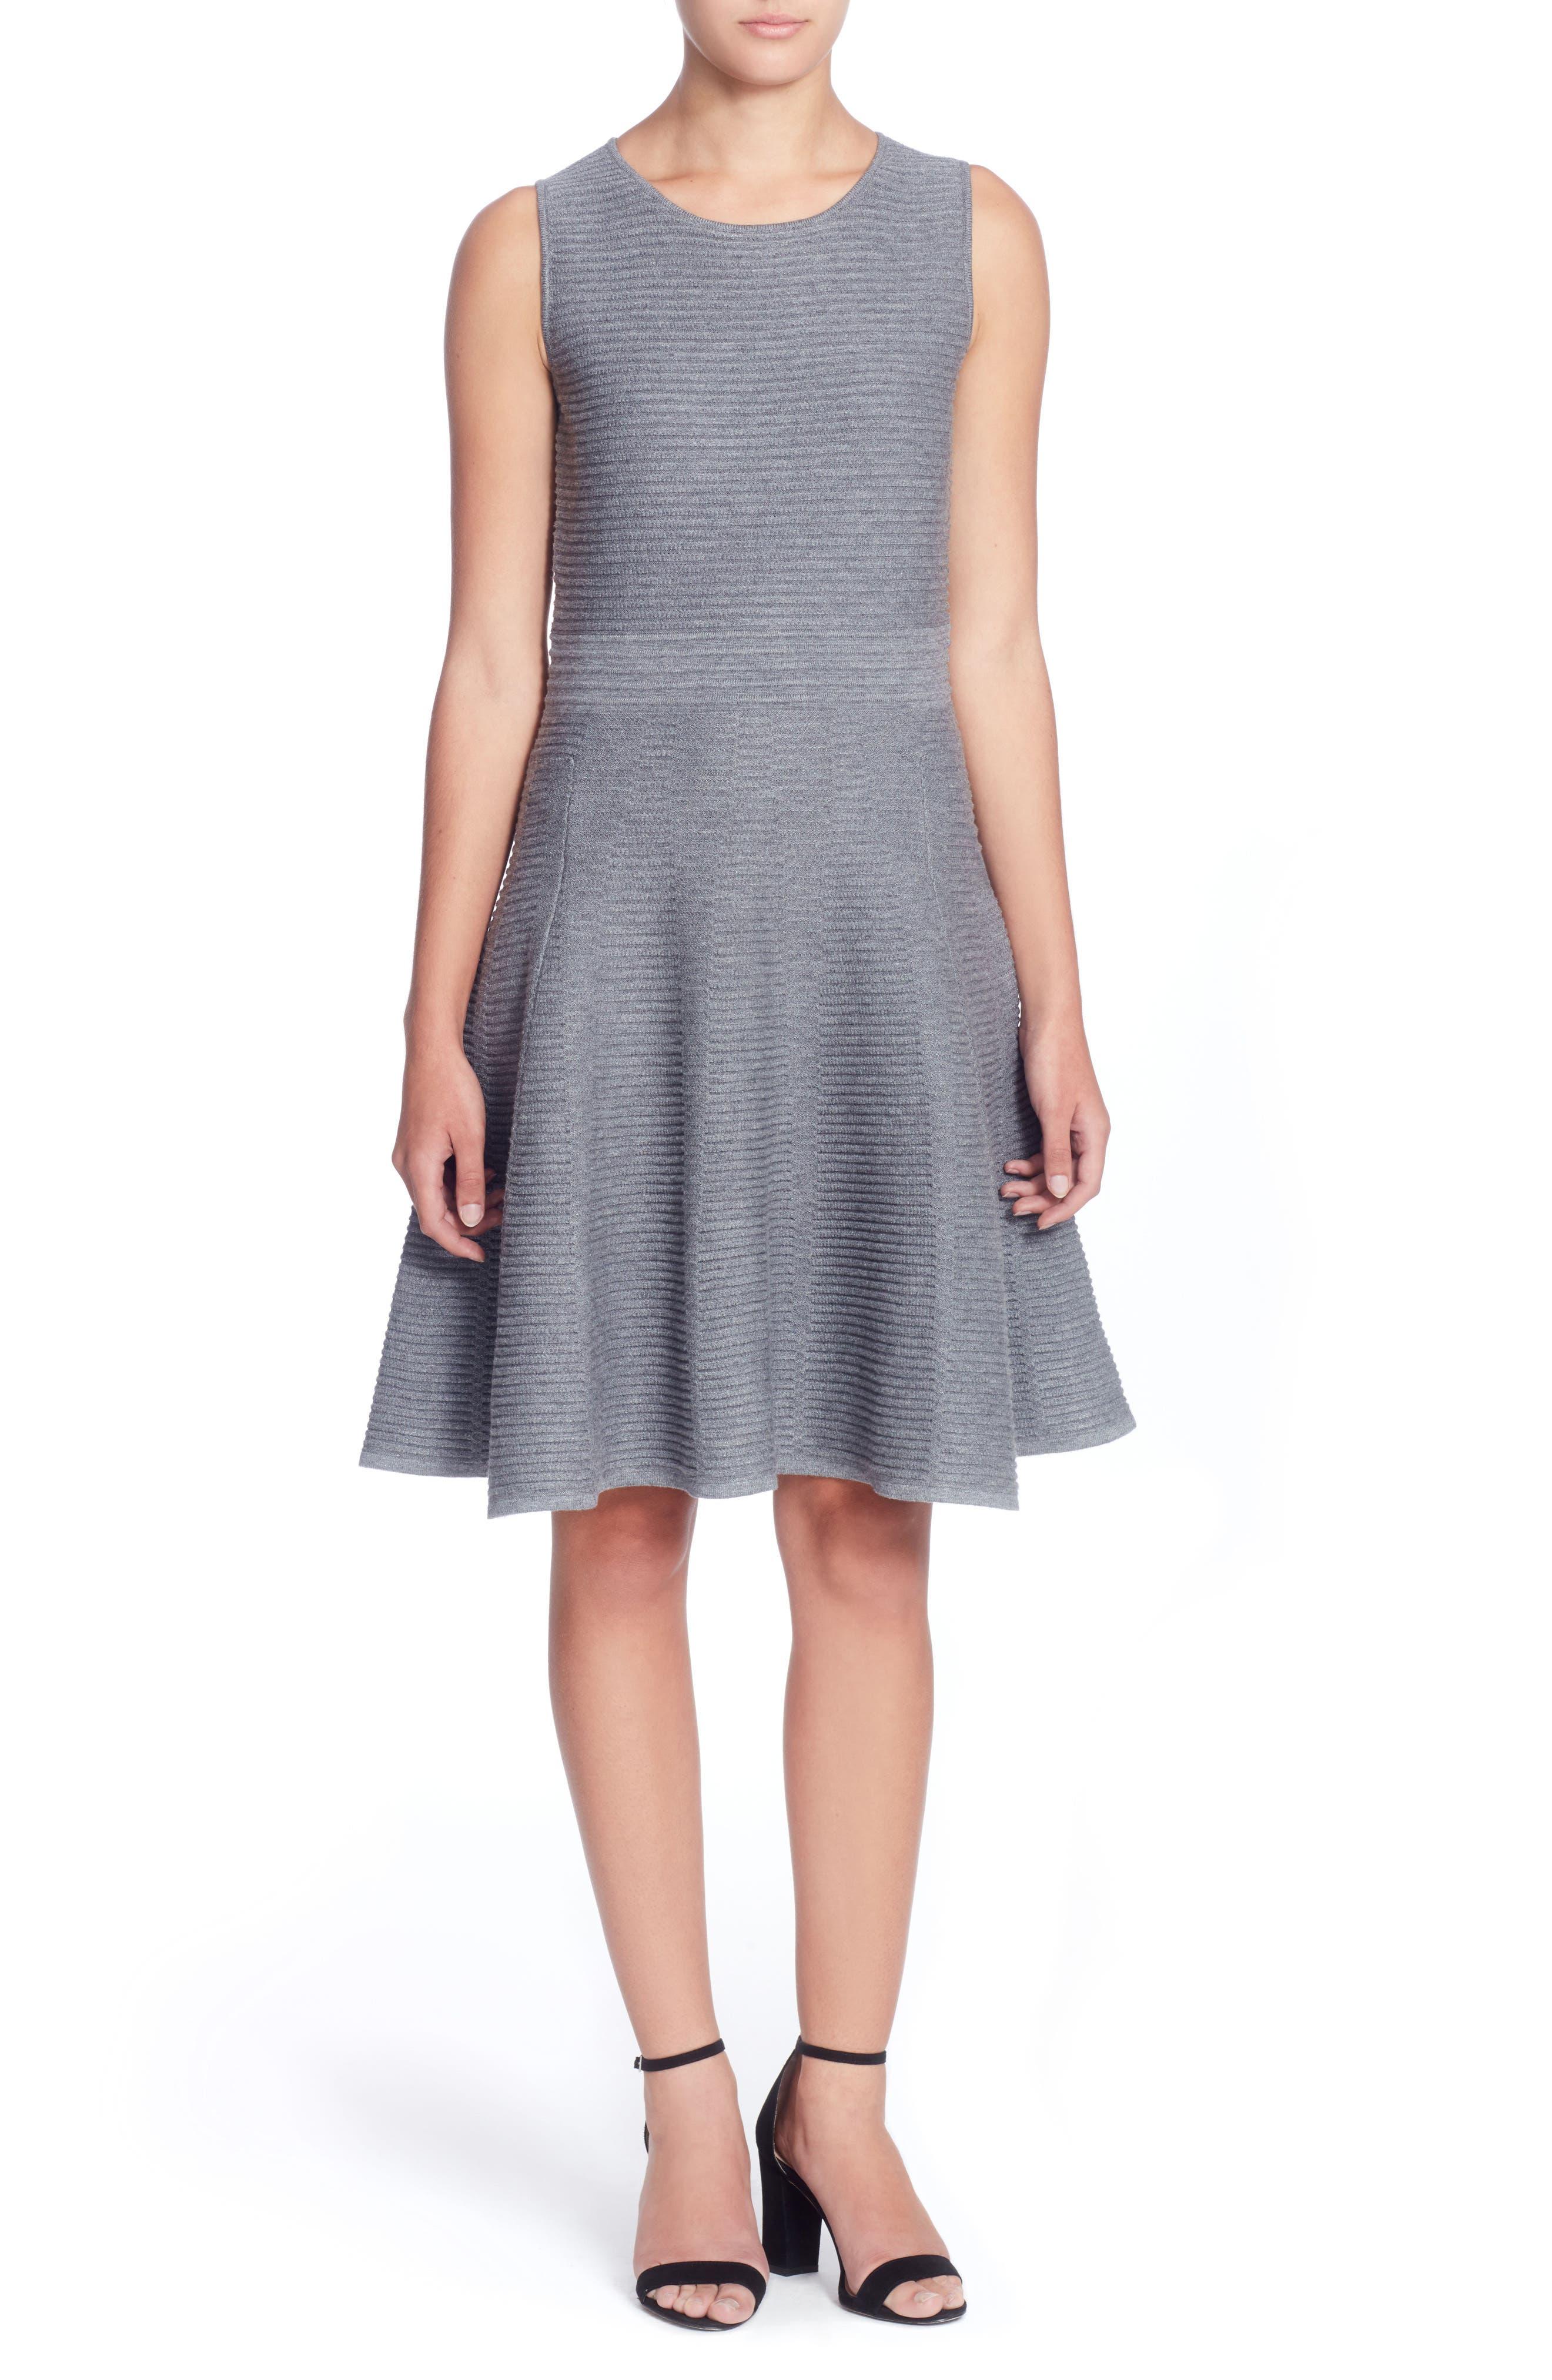 Catherine Catherine Malandrino Trisha Fit & Flare Dress